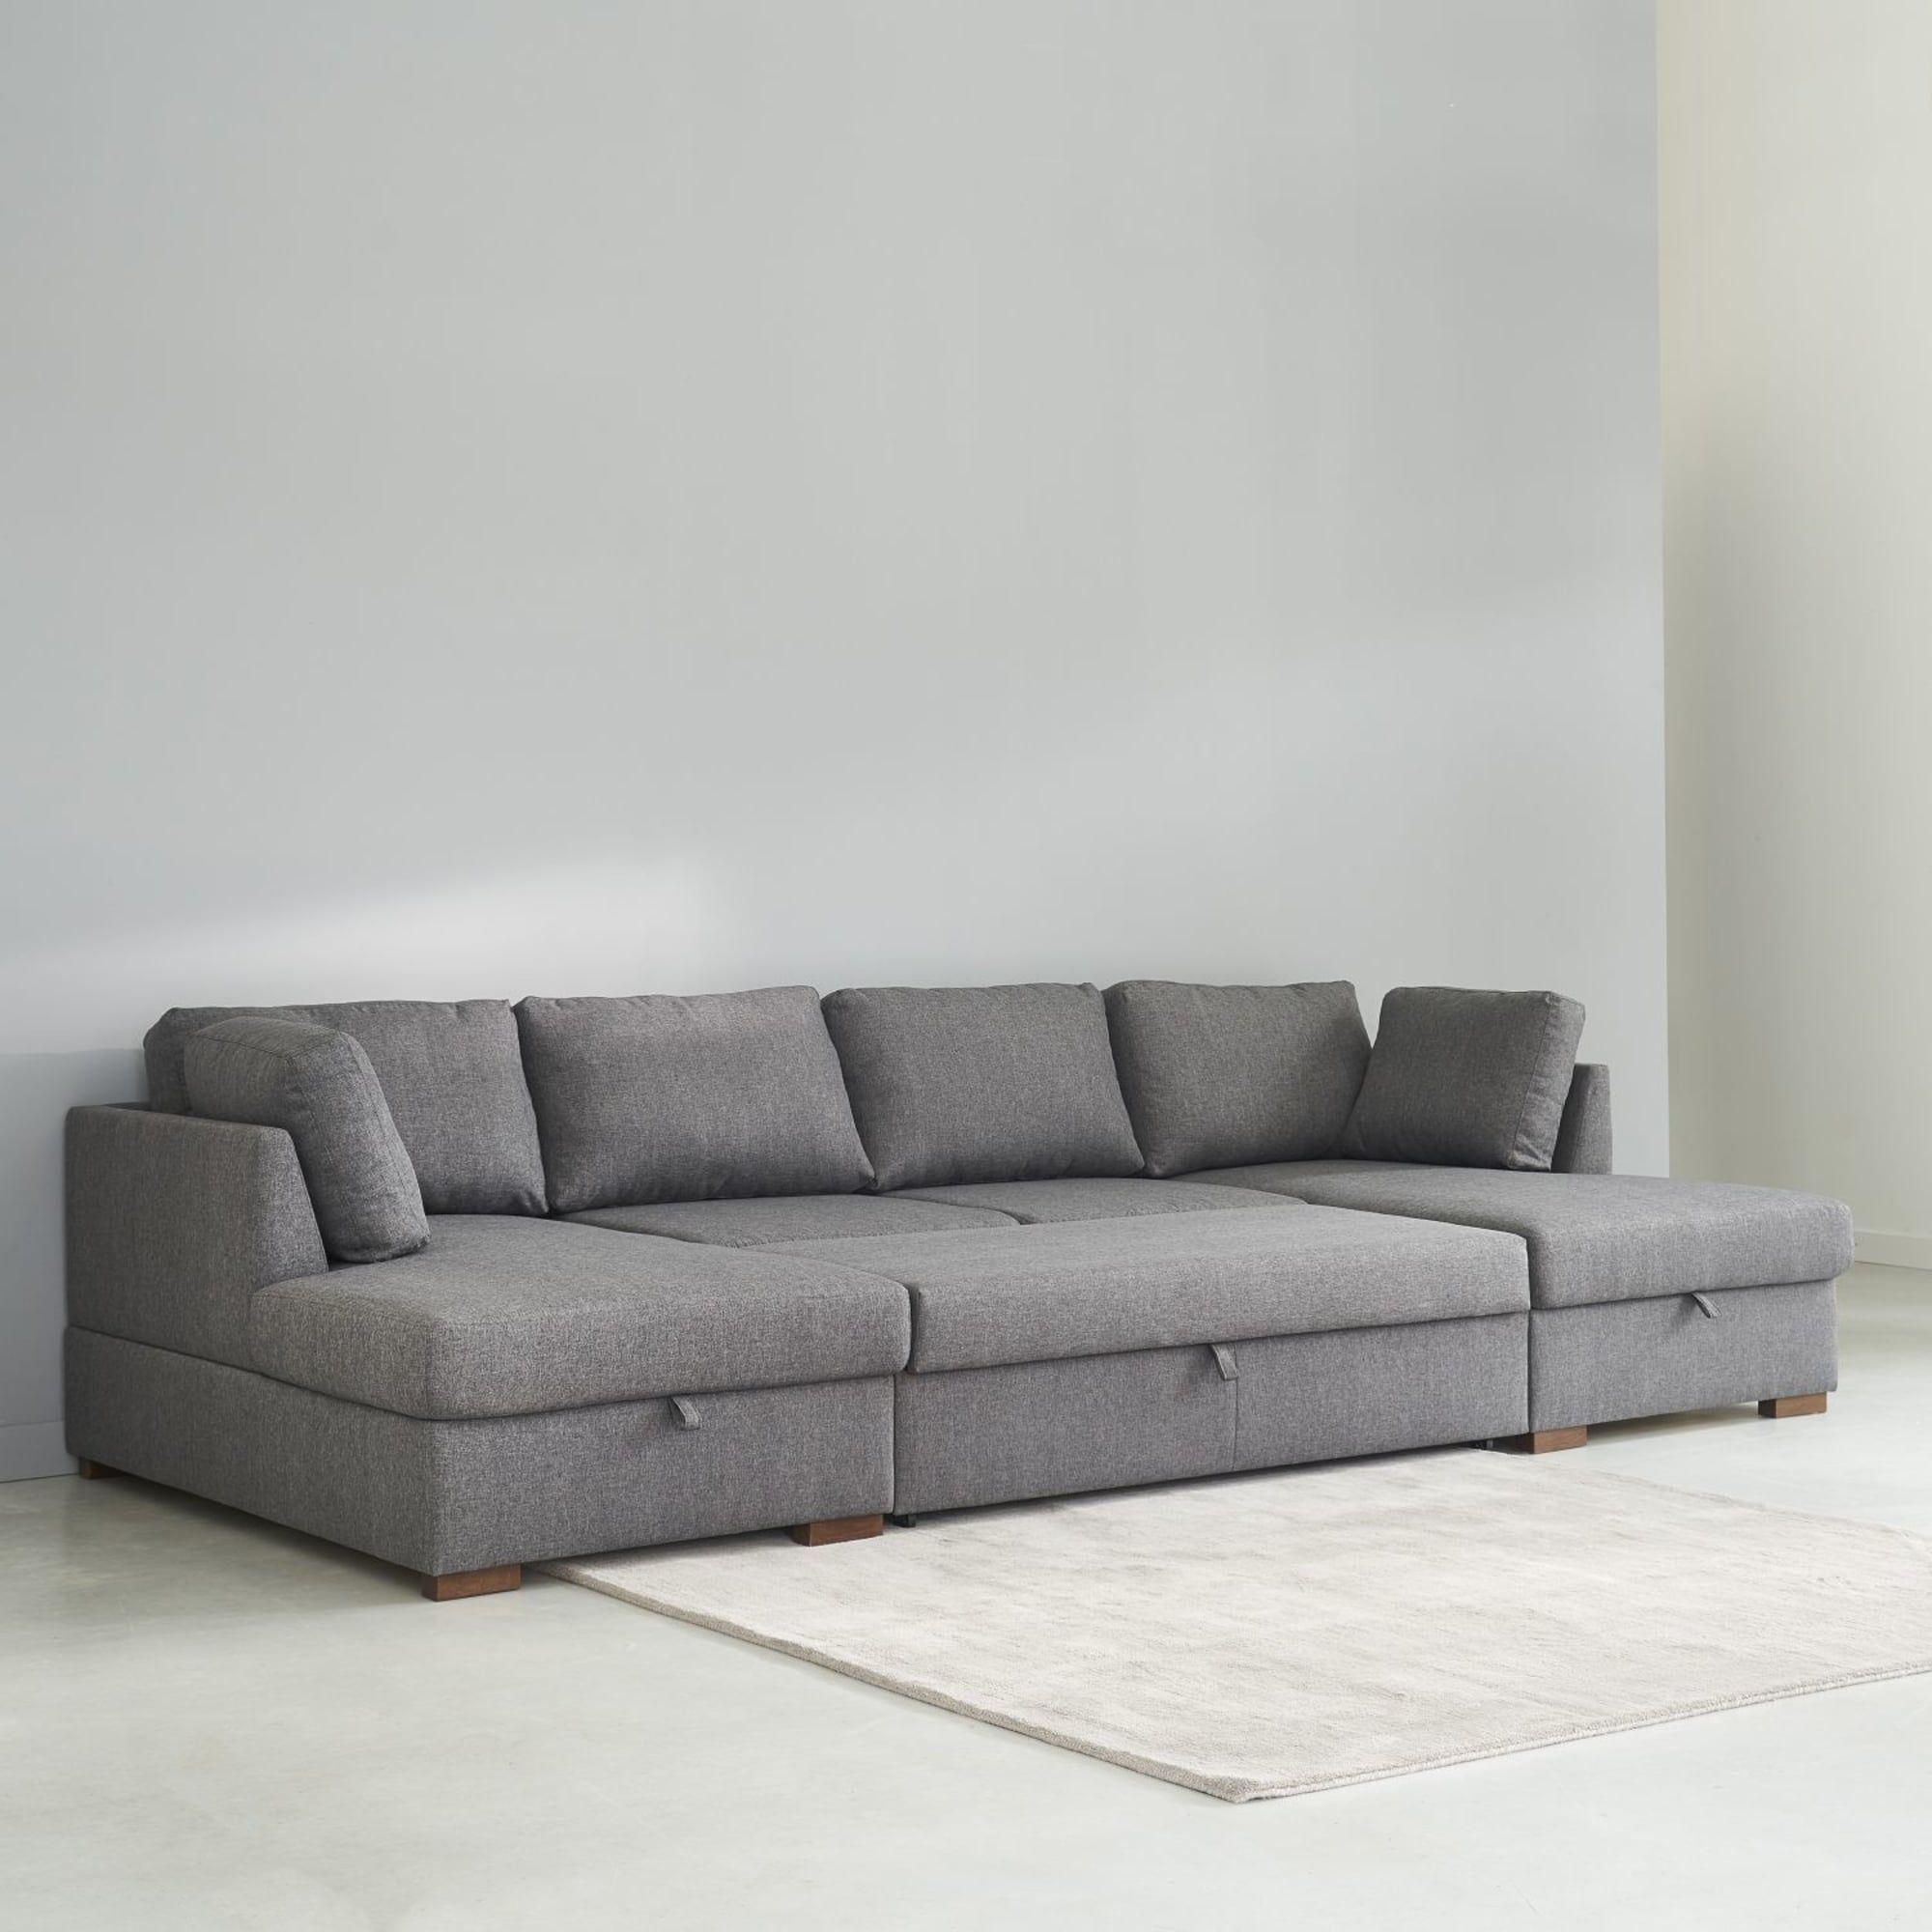 Grey 7 Seater U Shaped Sofa Bed U Shaped Sofa Bed U Shaped Sofa Sofa